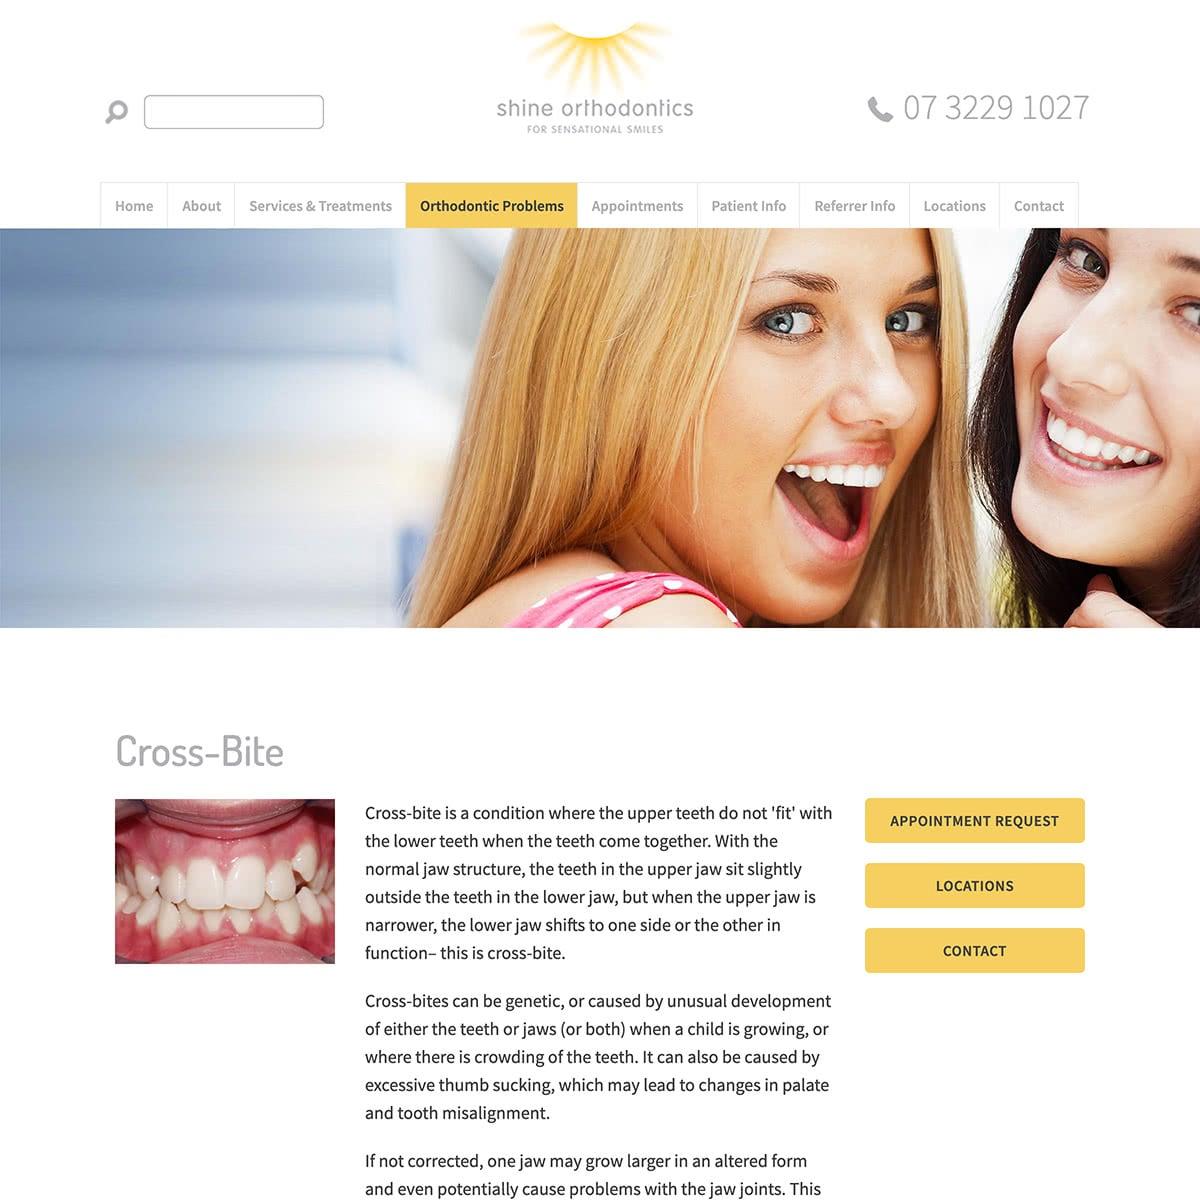 Shine Orthodontics - Orthodontic Problems